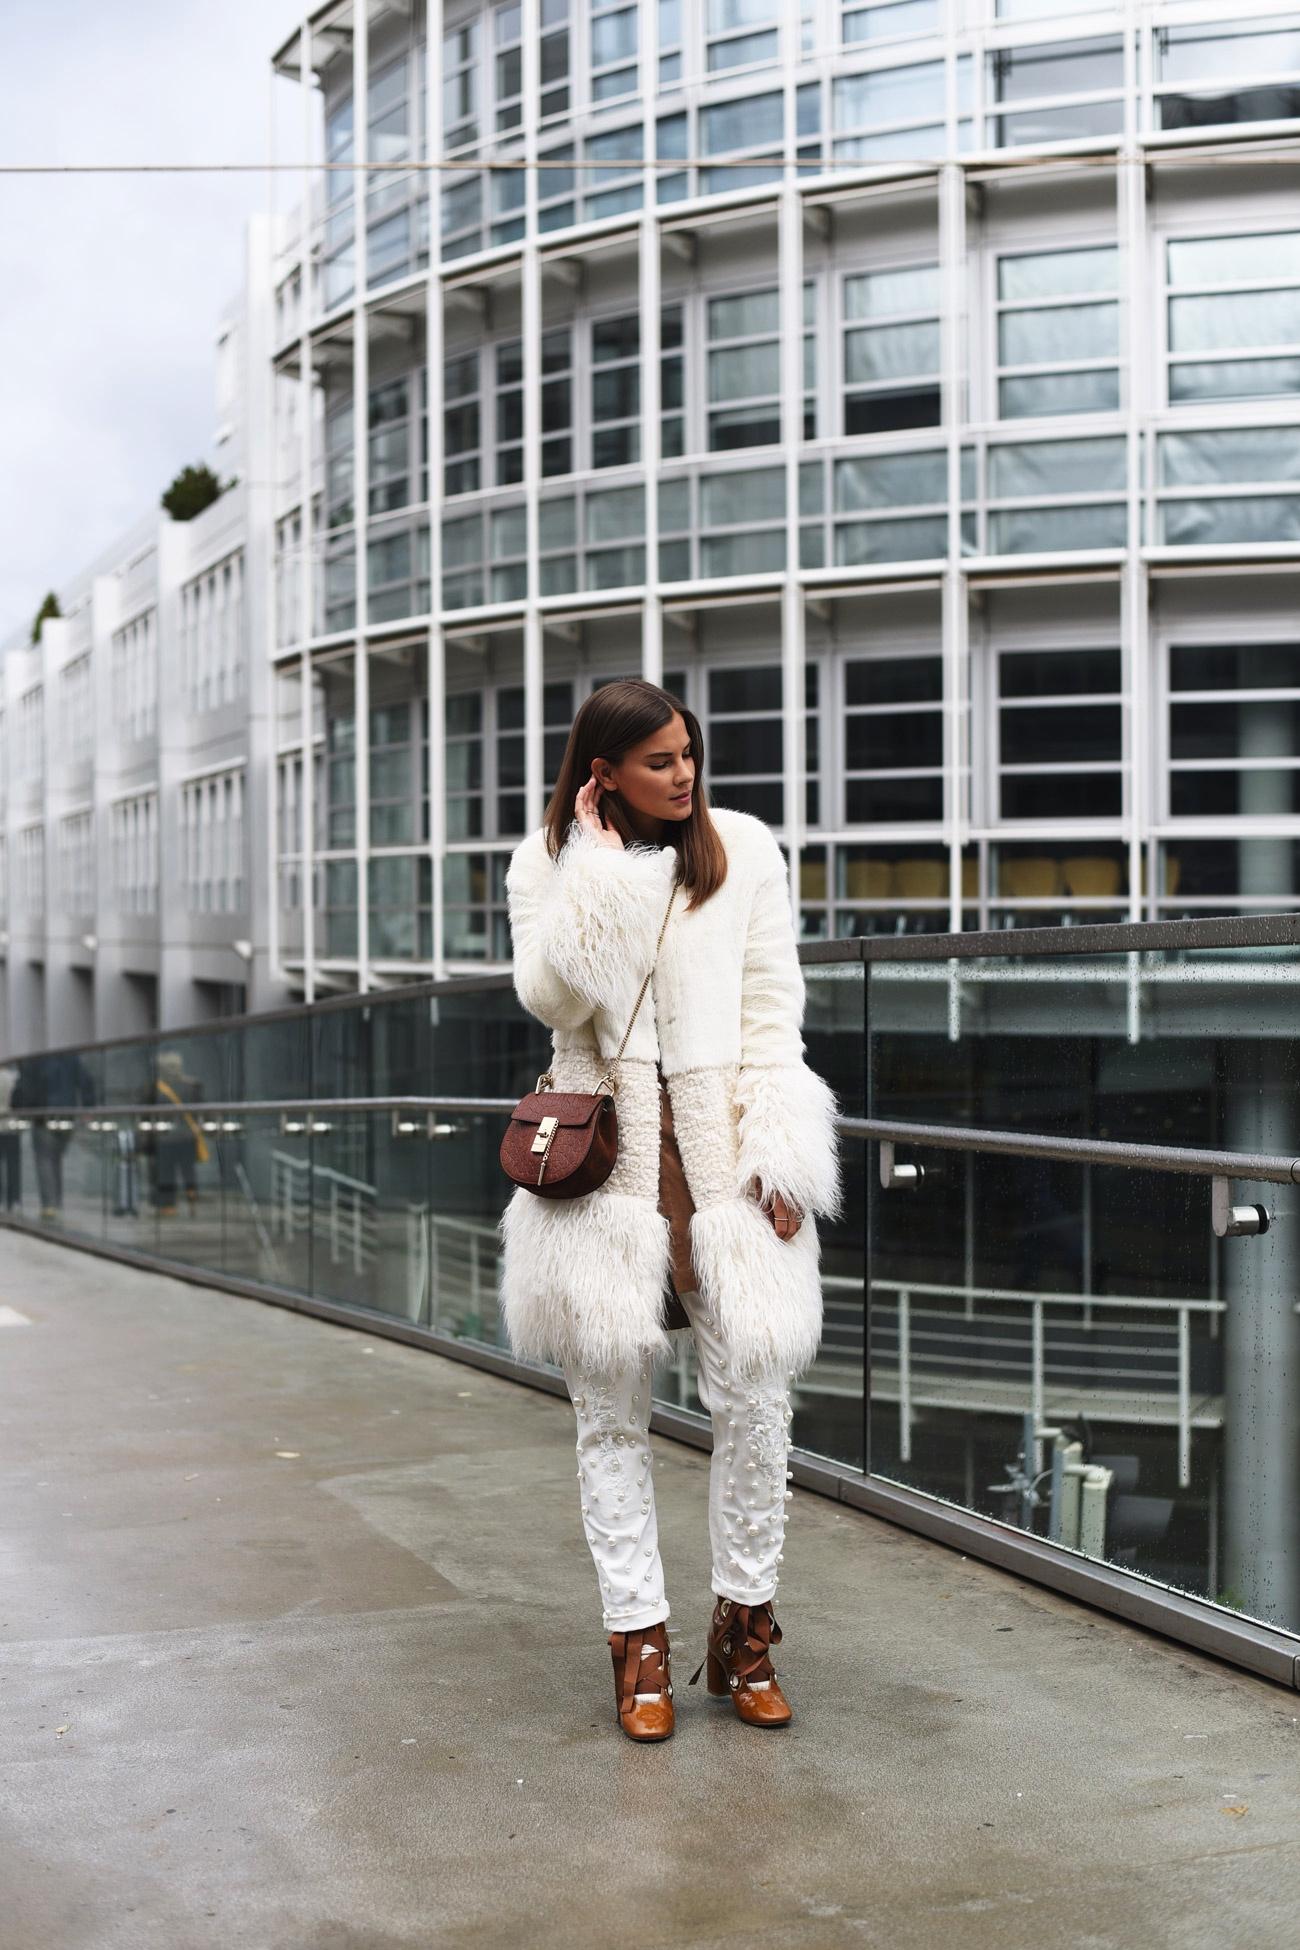 german-fashion-and-lifestyle-blog-munich-germany-fashiioncarpet